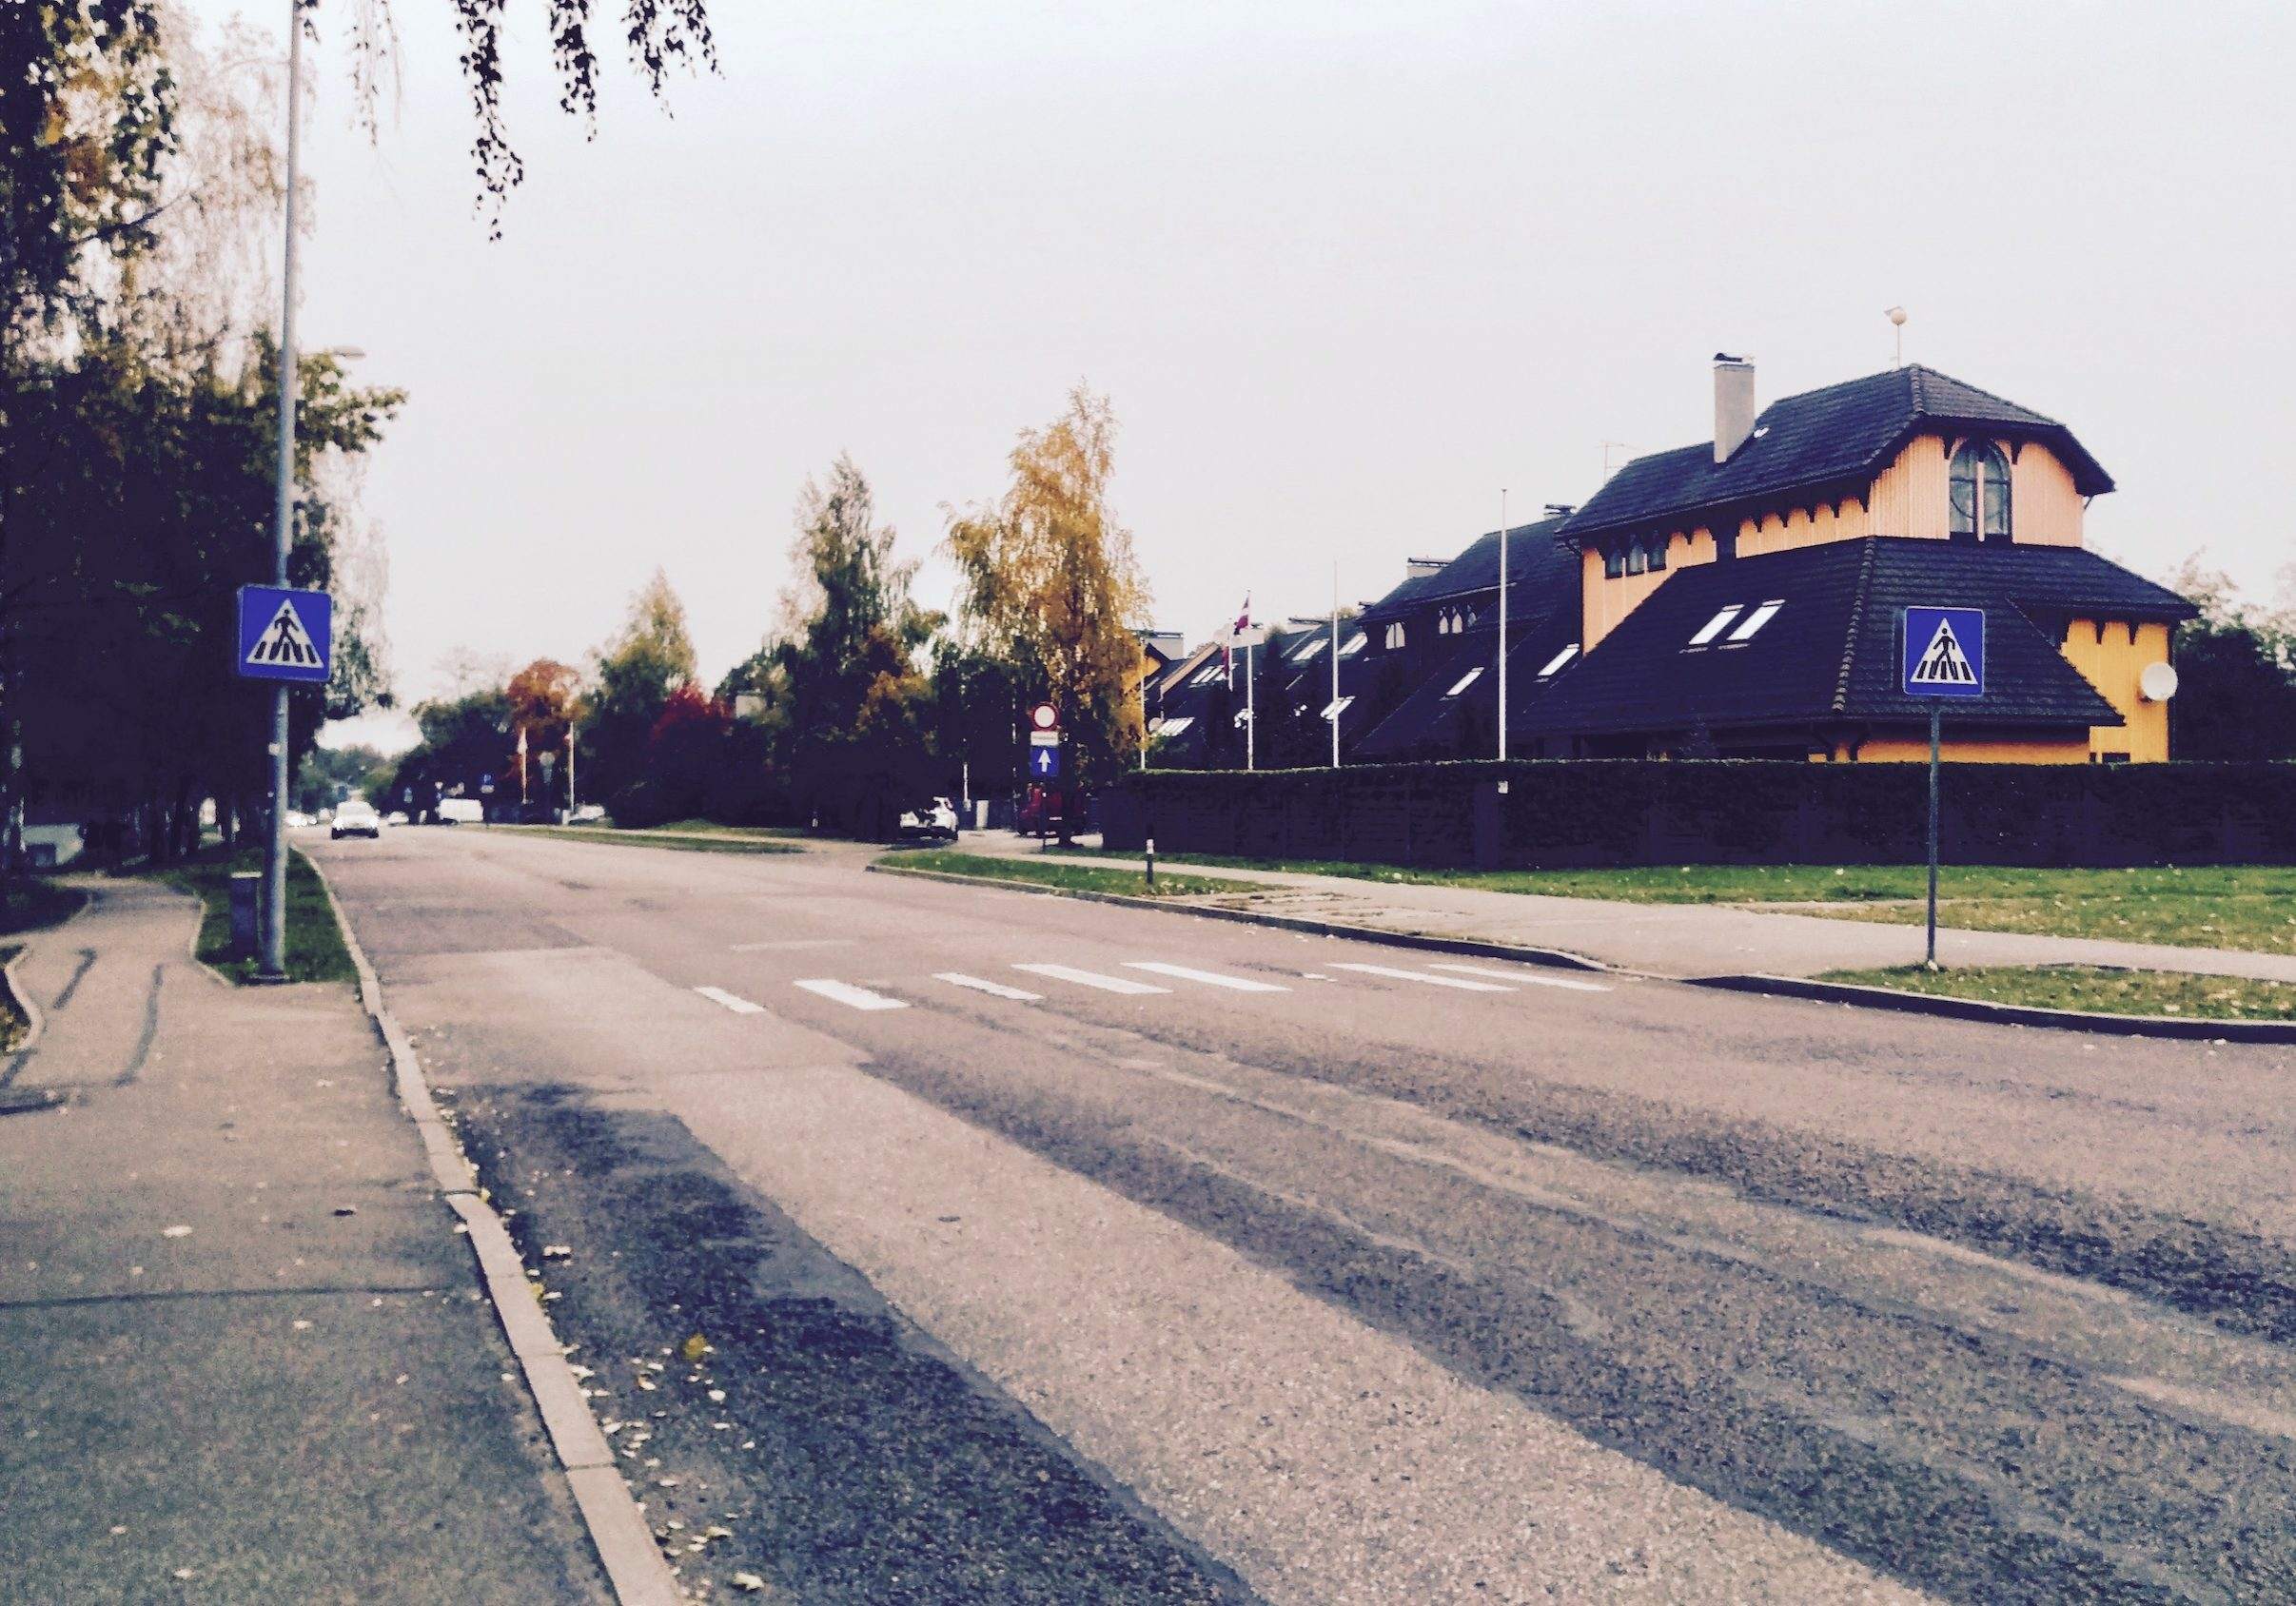 Ķīpsalas street in the Kipsala